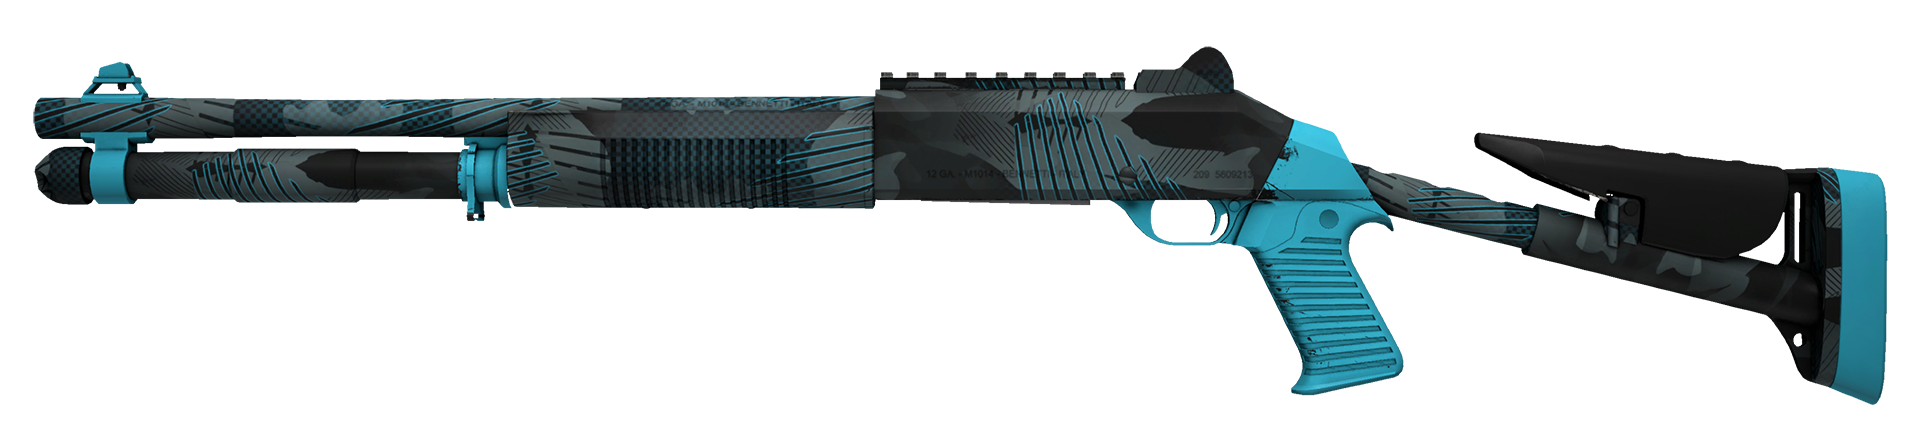 XM1014 Slipstream Large Rendering